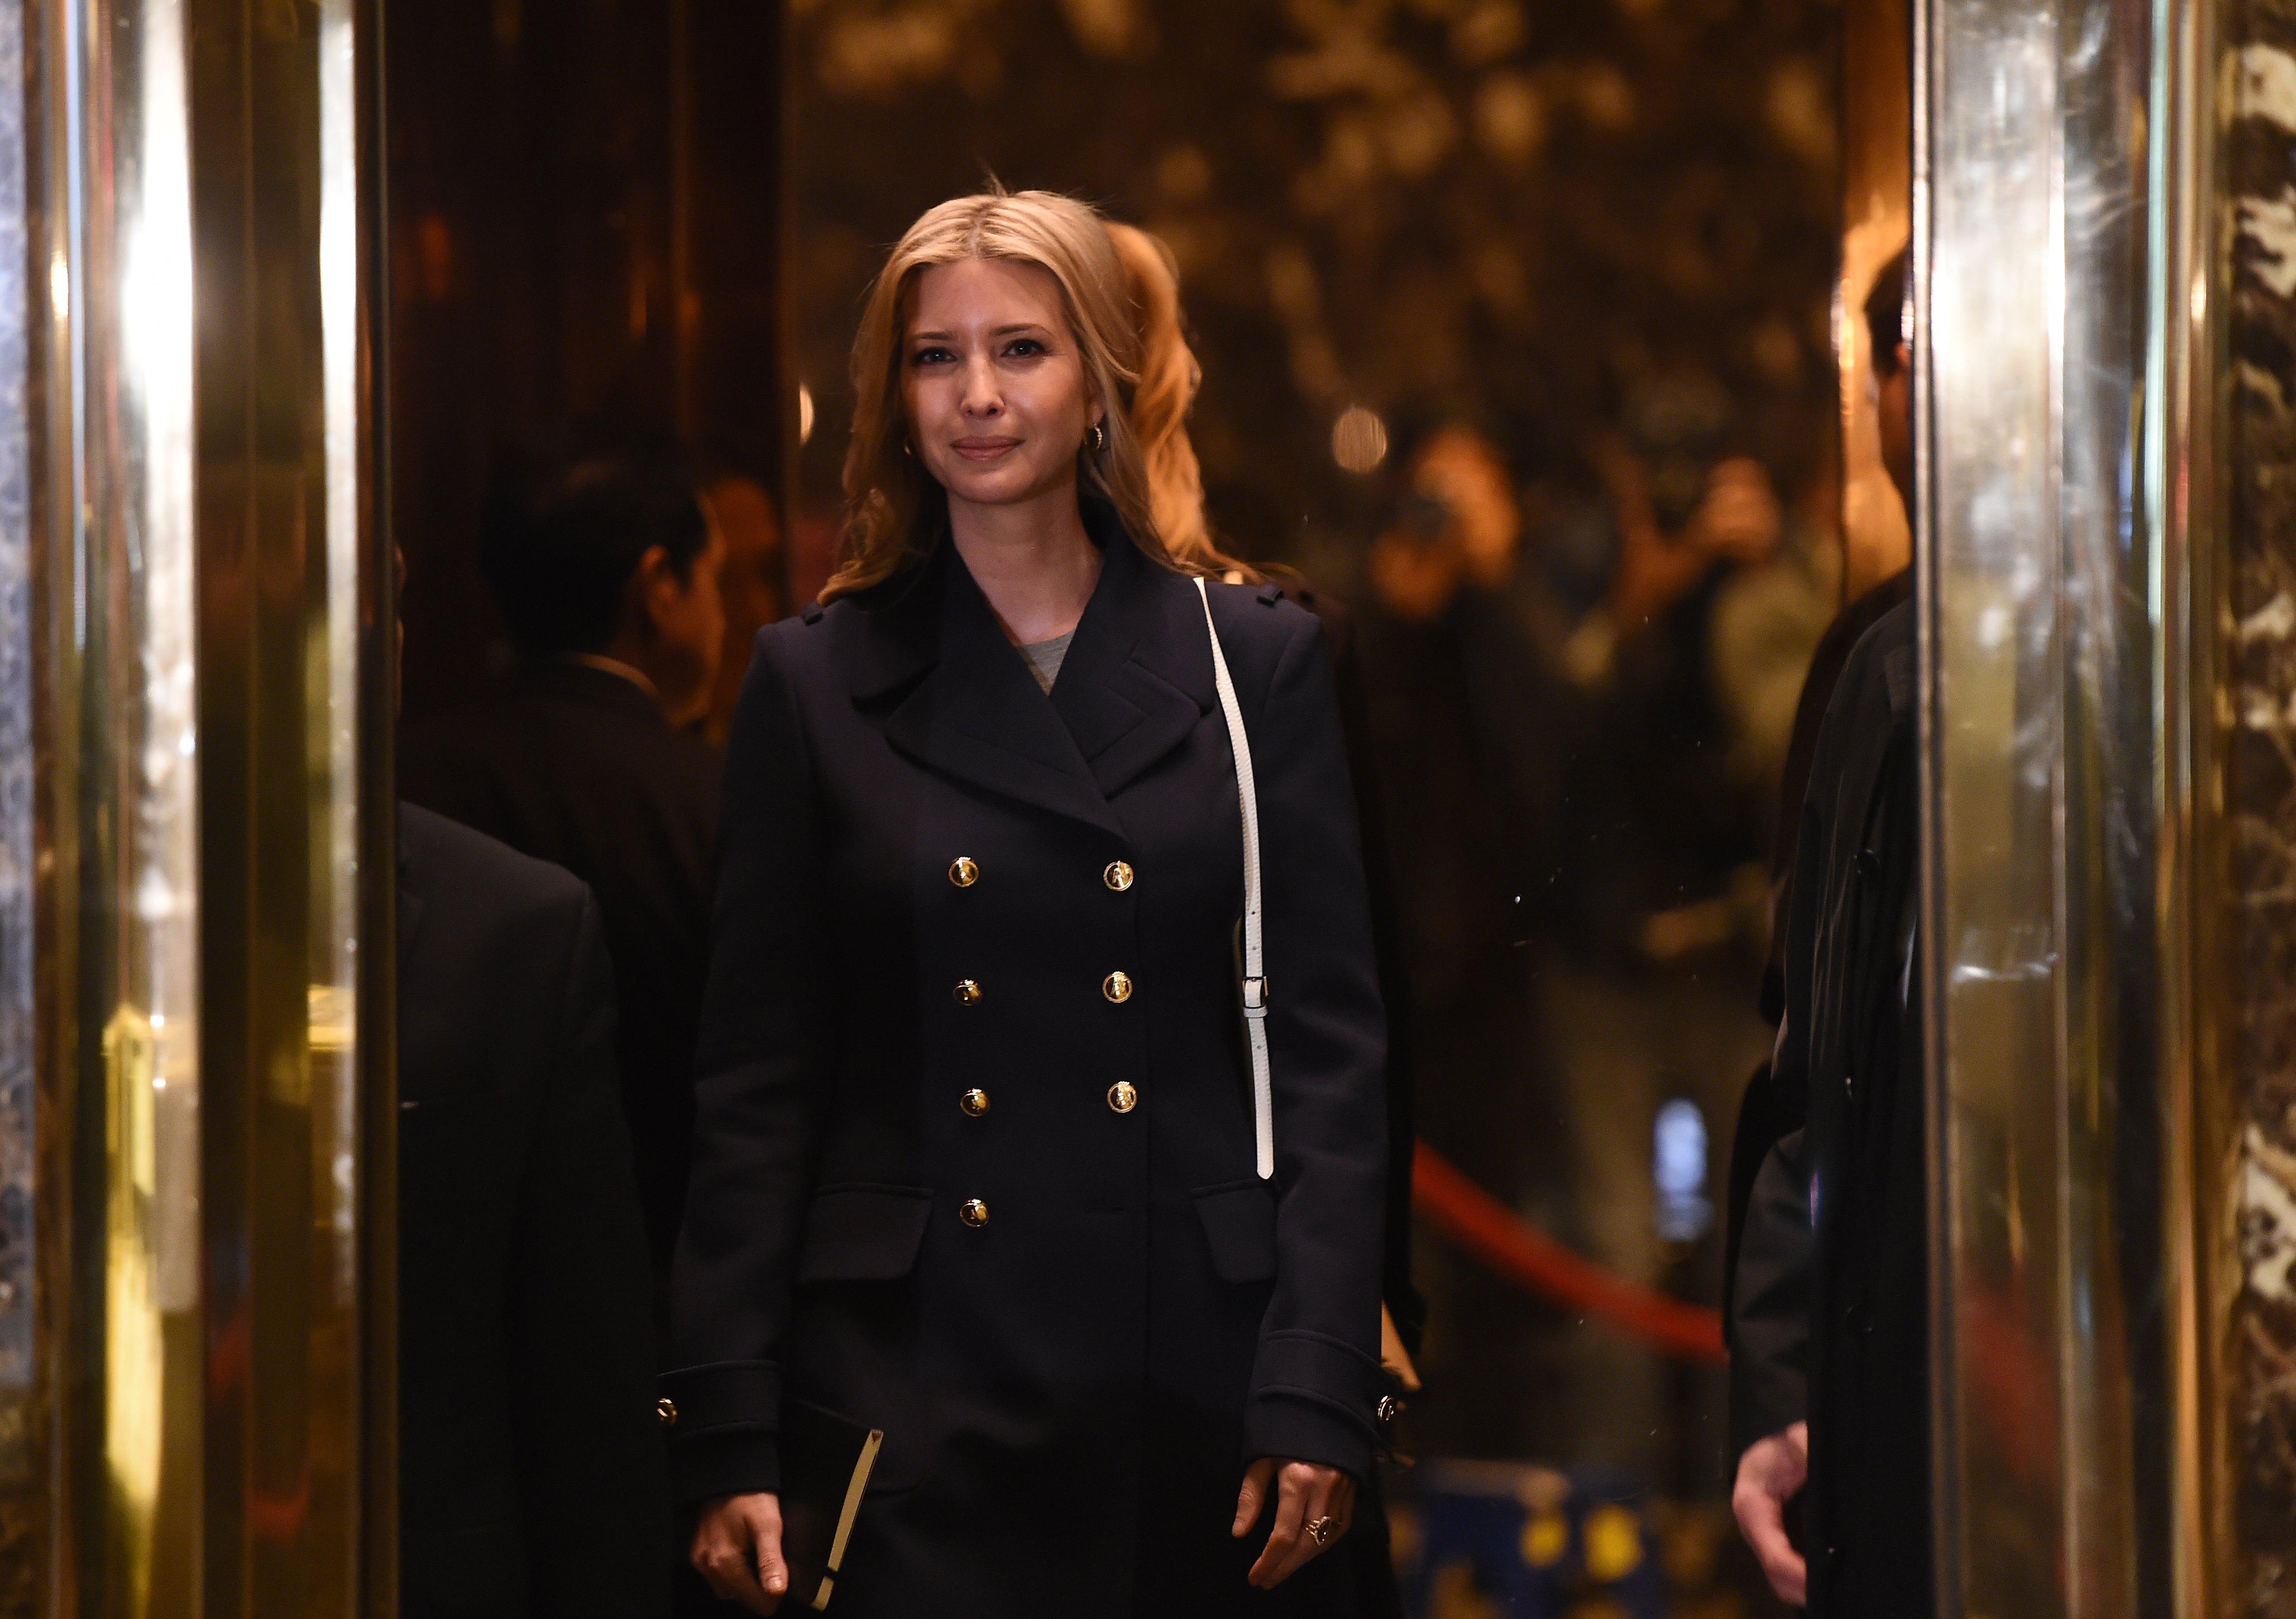 Ivanka Trump Harassed on JetBlue Plane: Reports